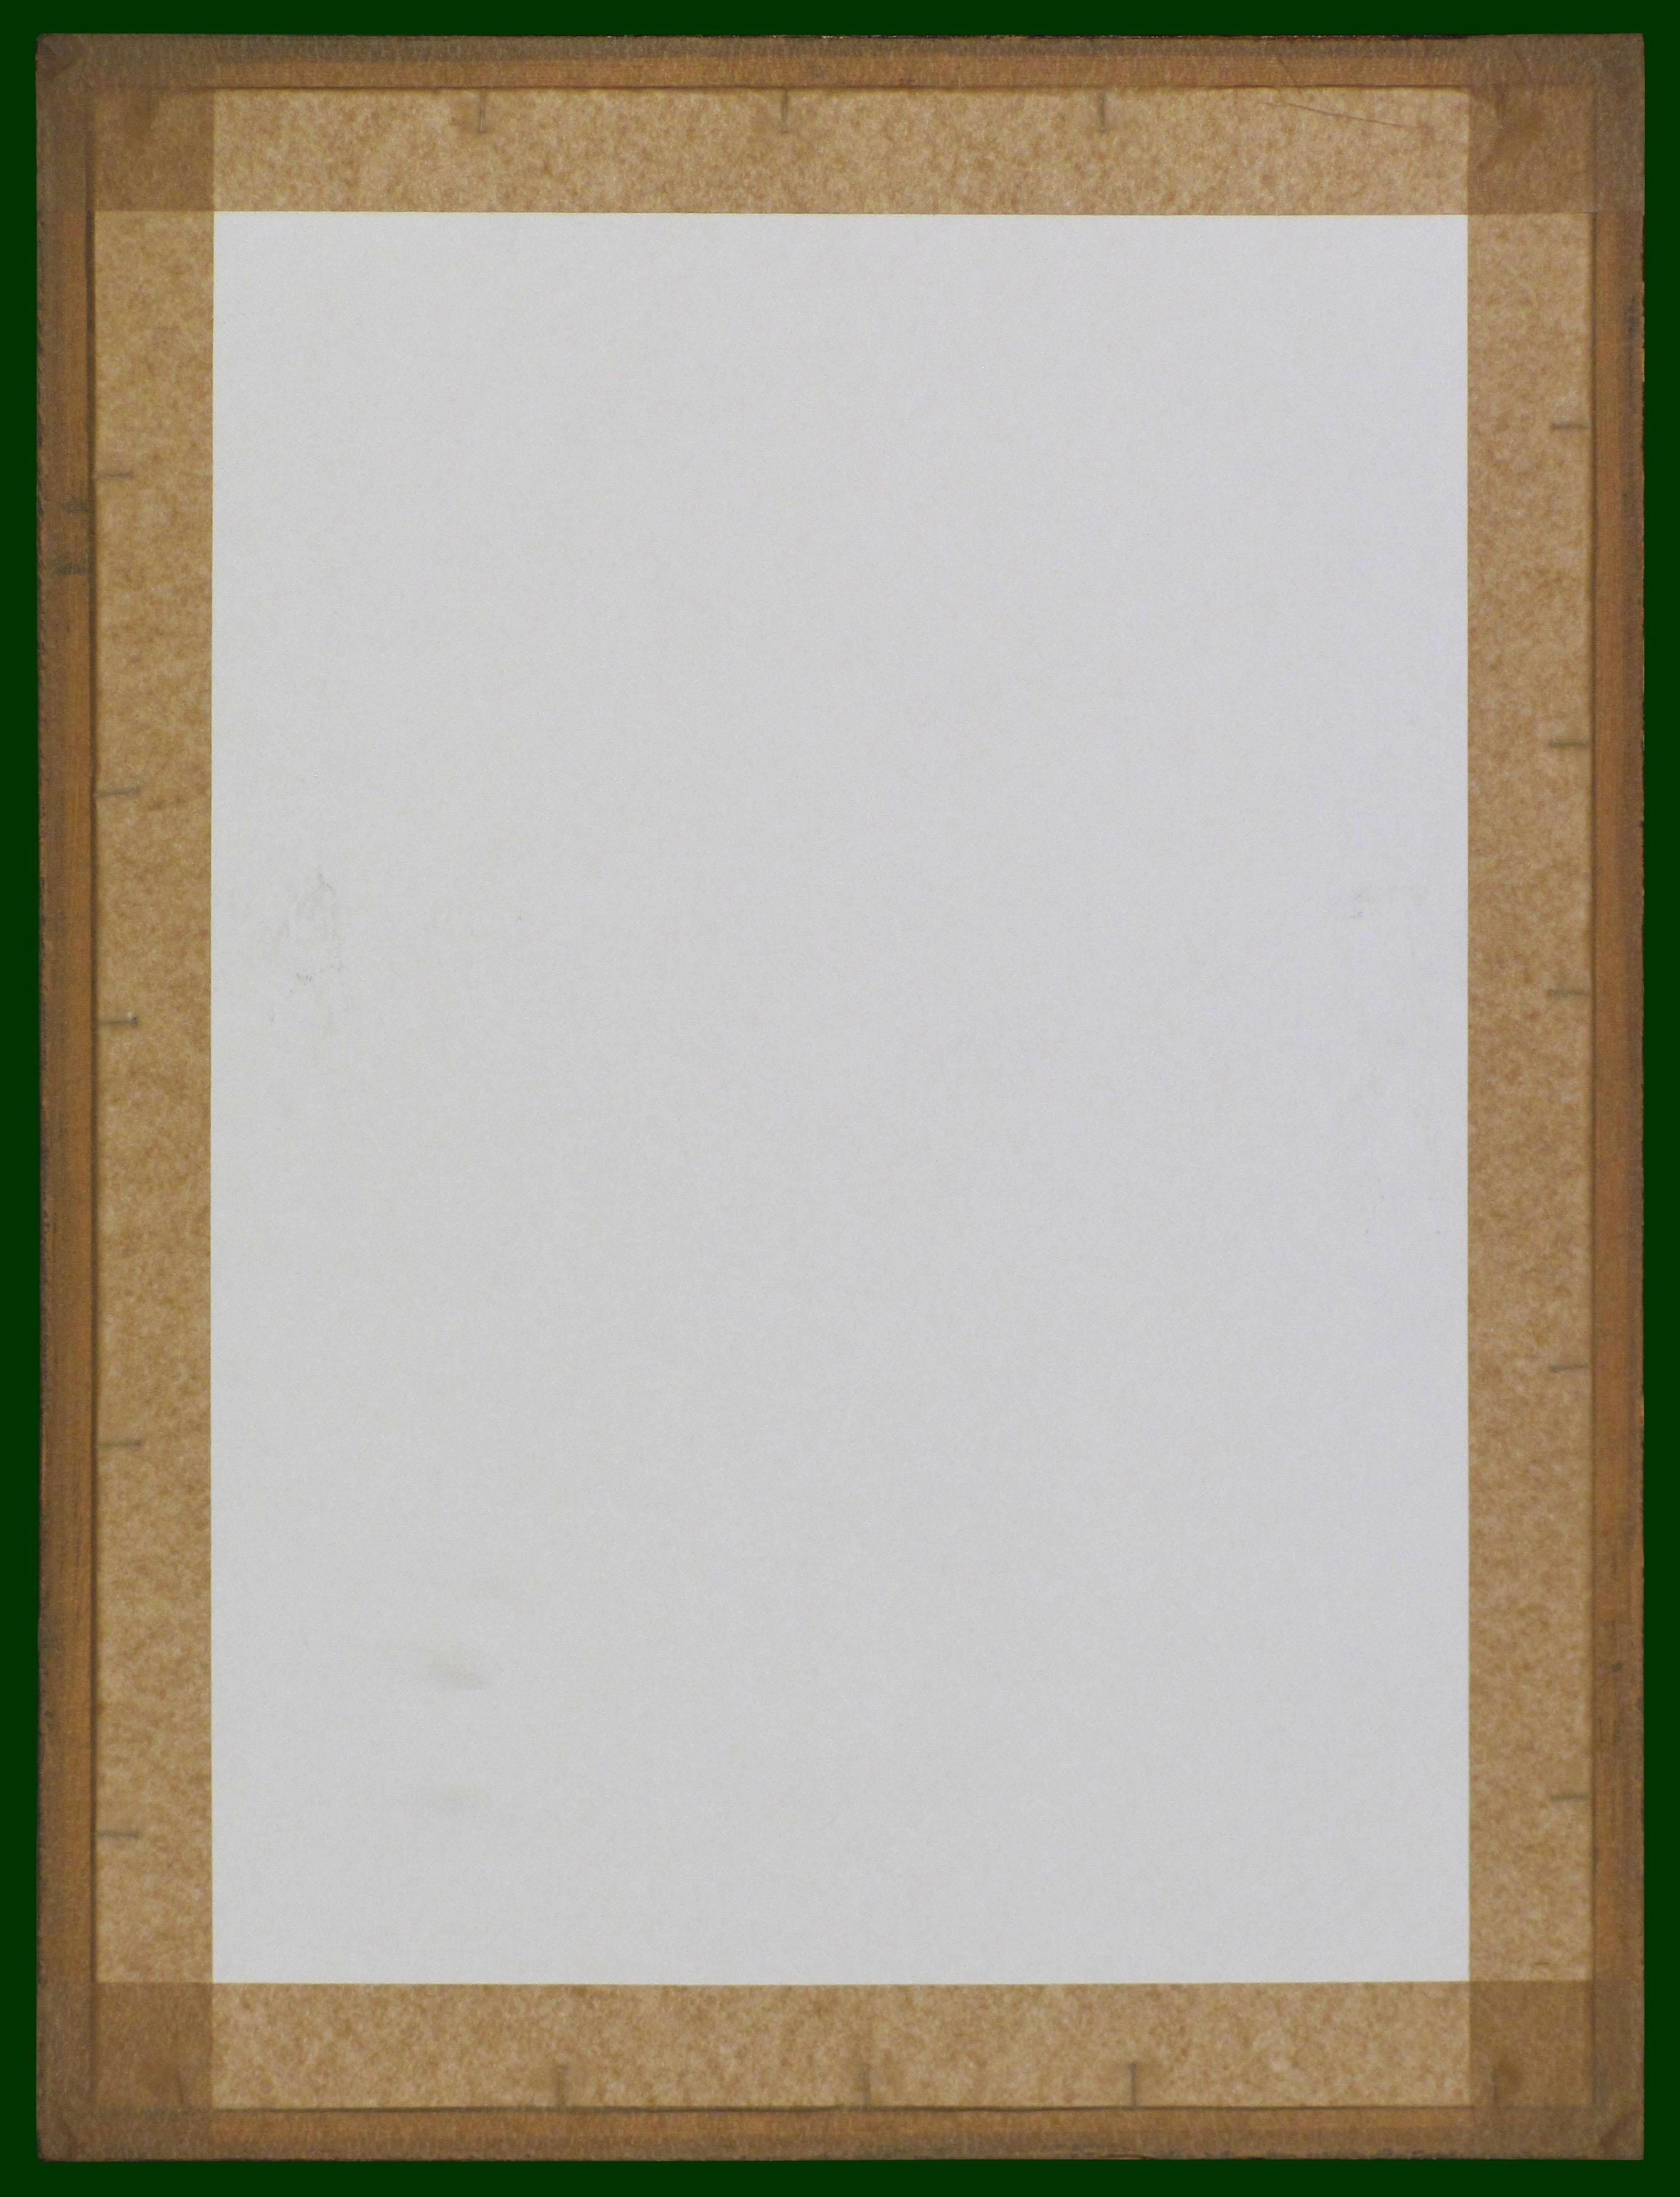 203-25hát.jpg (2728×3568)